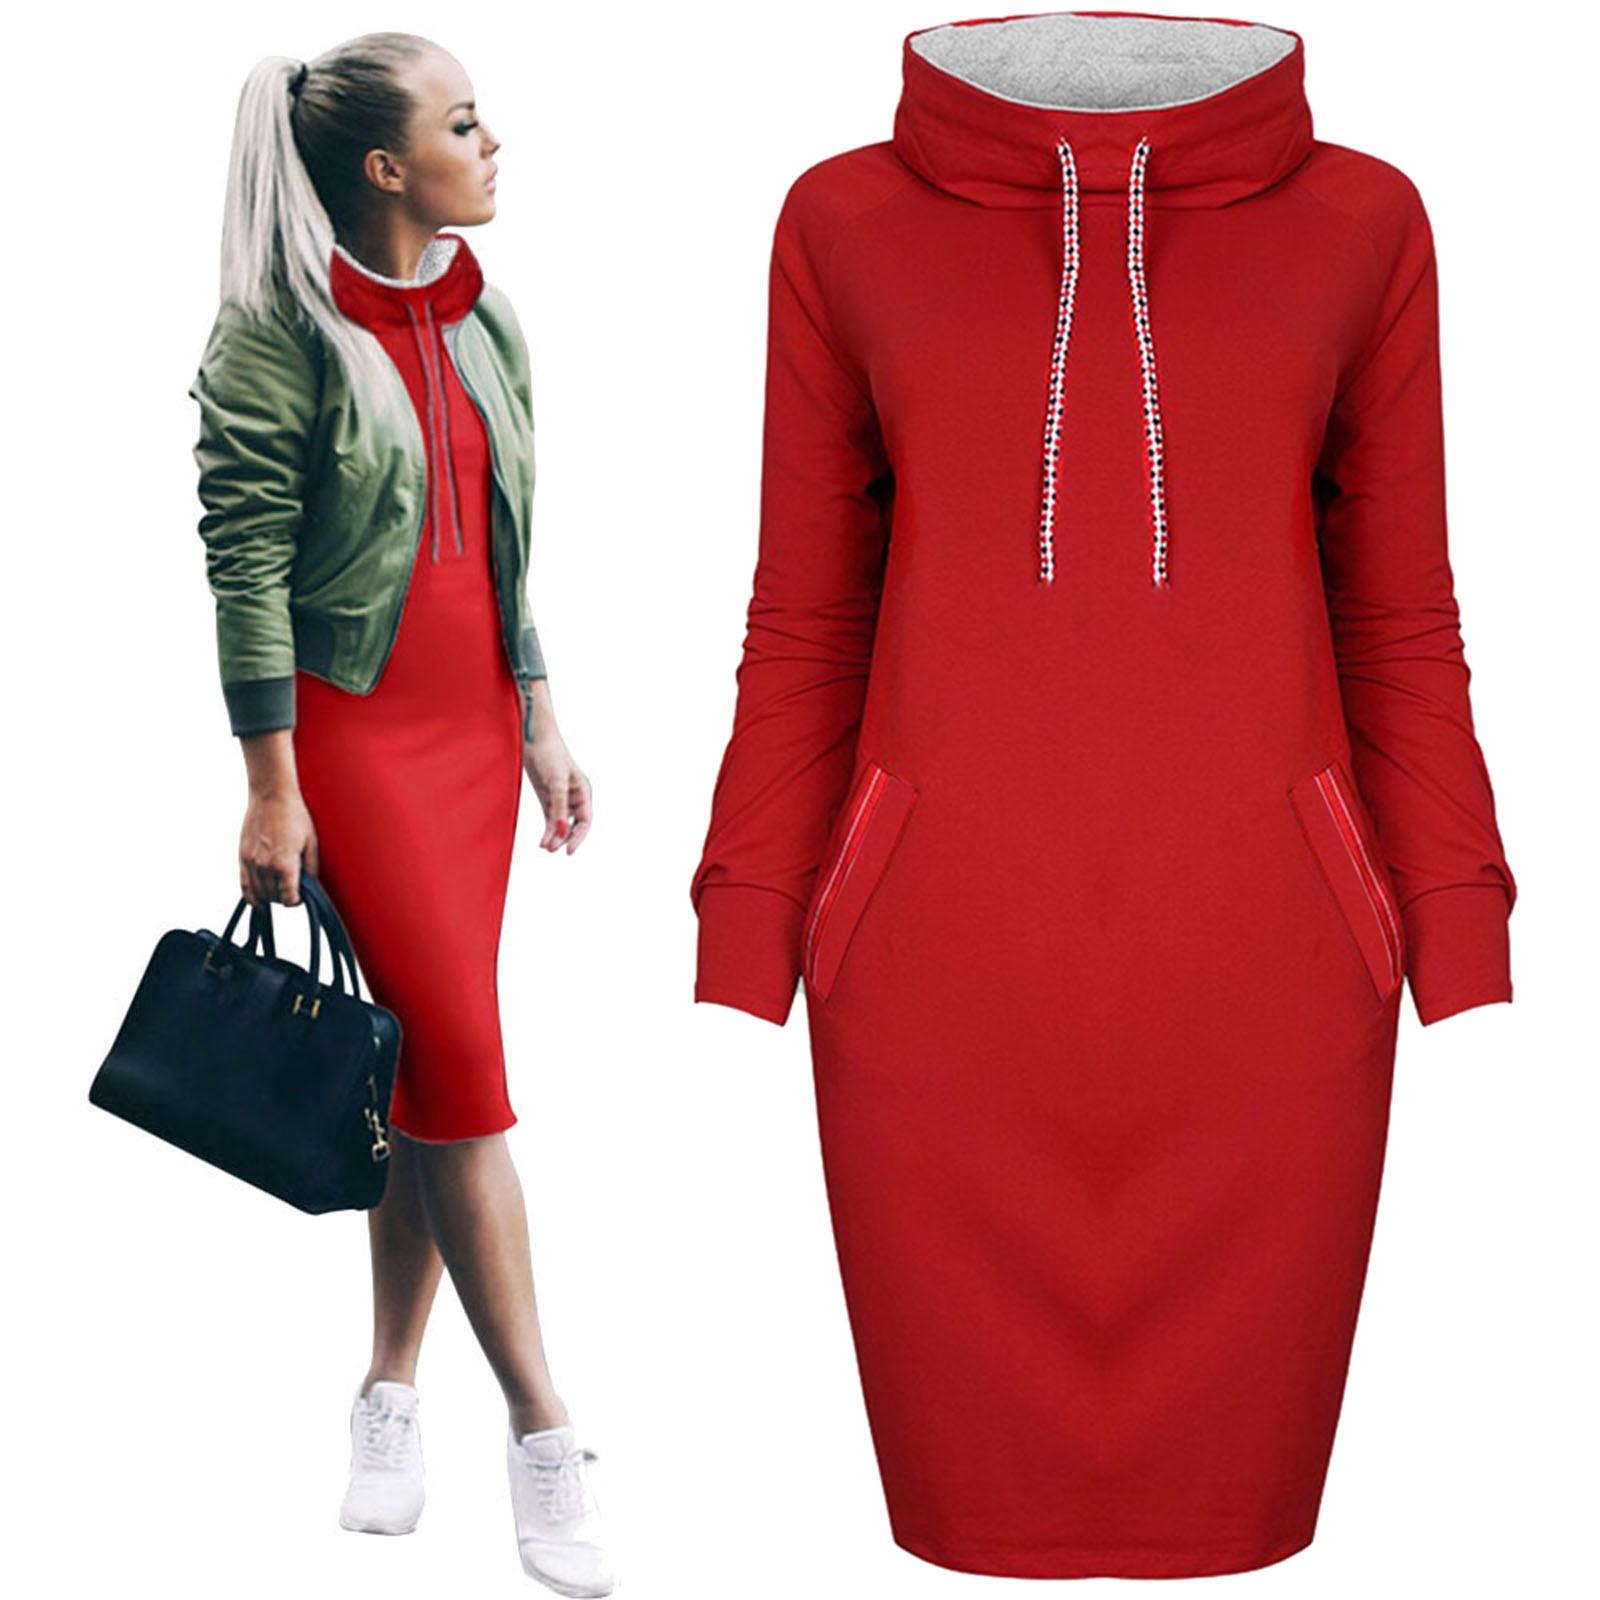 Women Autumn Warm Hooded Dress Casual Winter Shirt Dress Ladies Long Sleeve Mini Fit Slim Sweatshirt